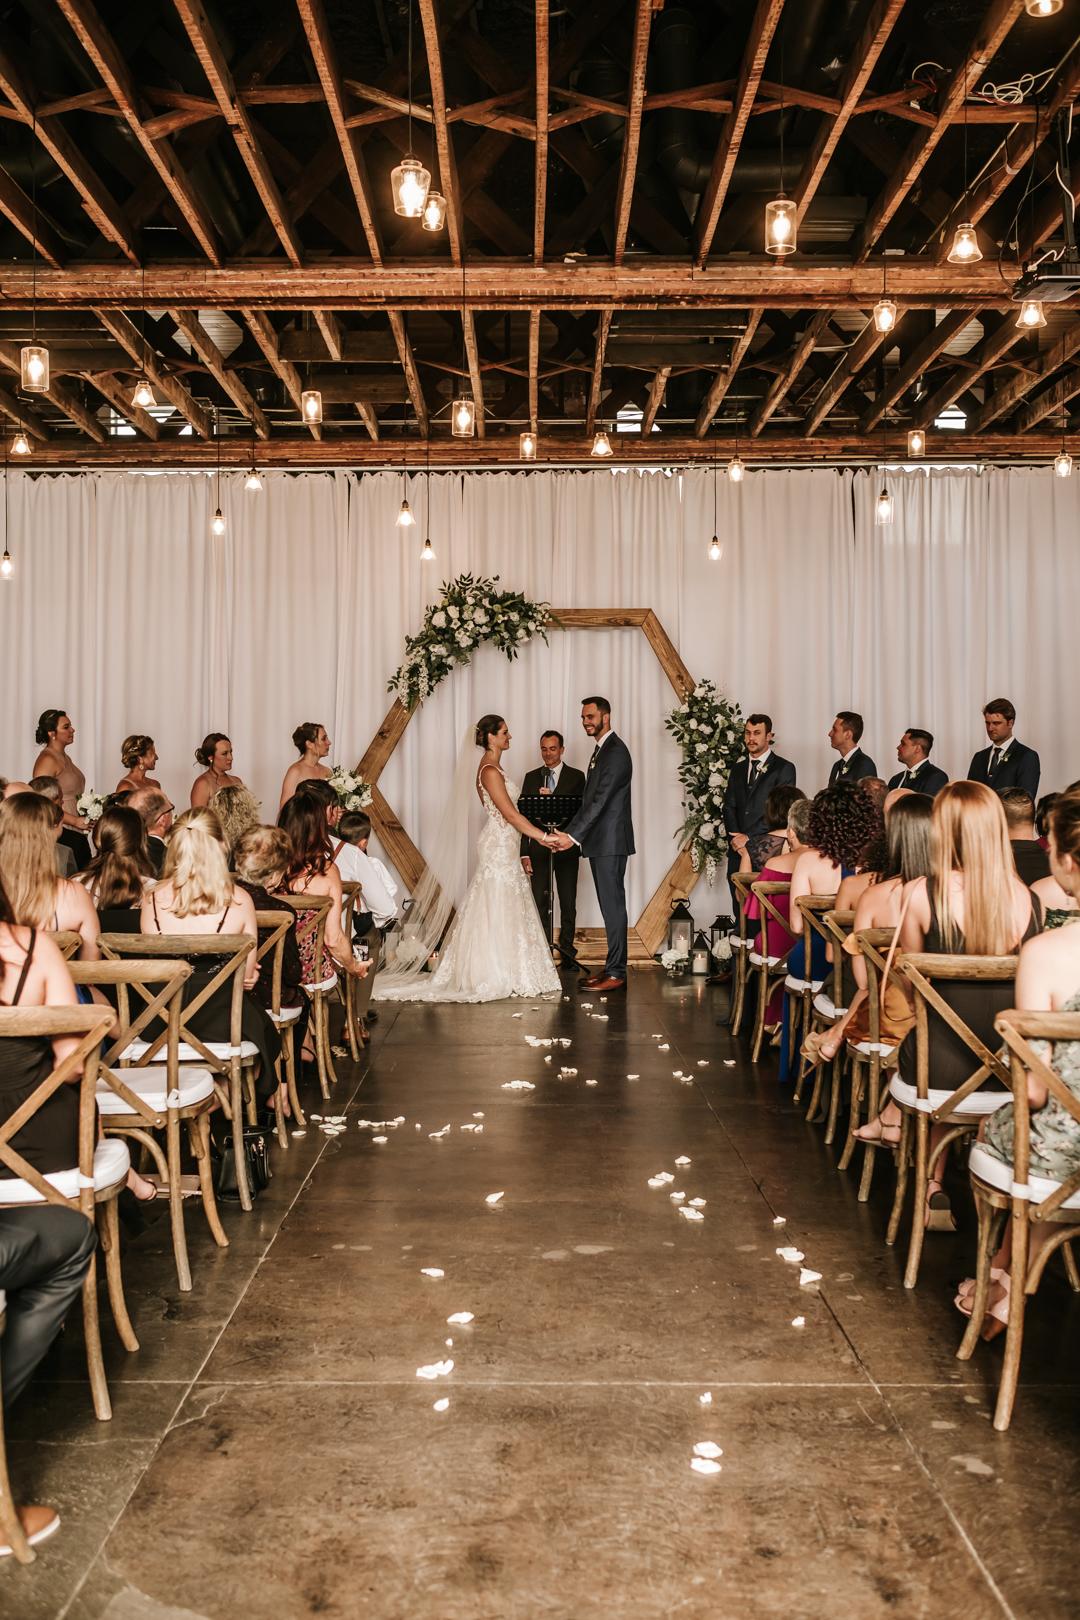 cavu-tampa-wedding-charlie-lauren-58.jpg